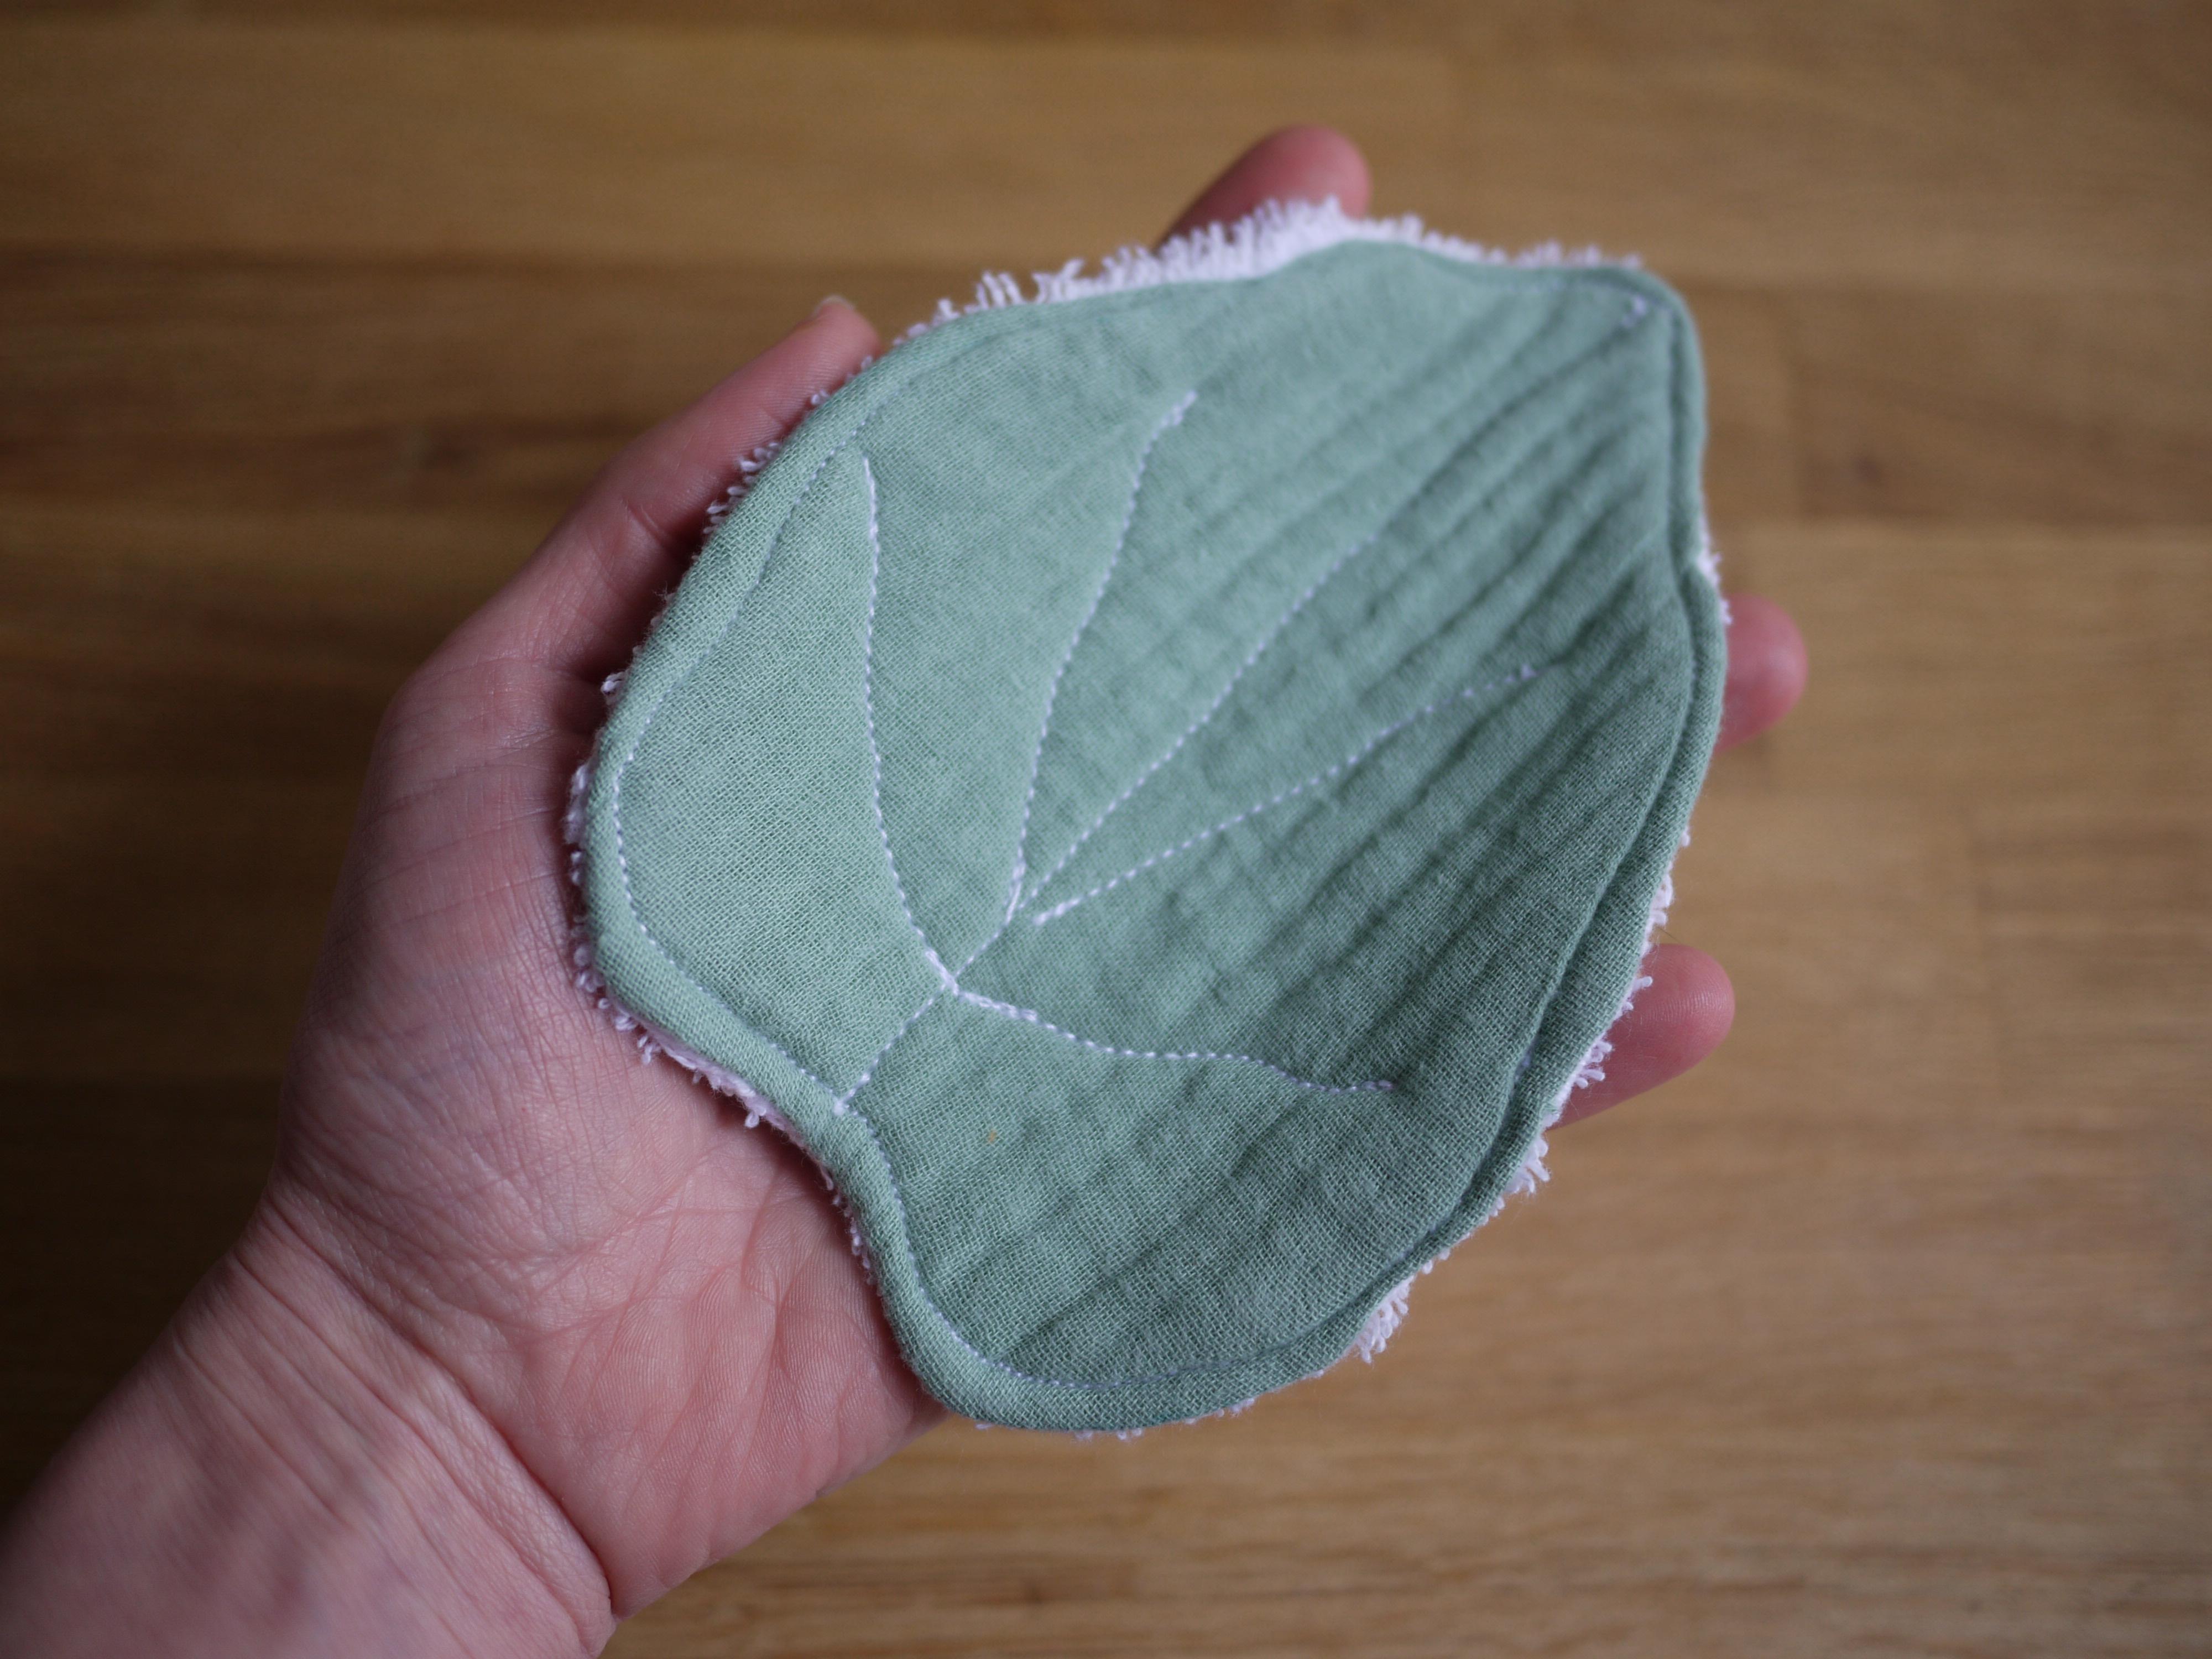 une grande lingette en forme de feuille verte